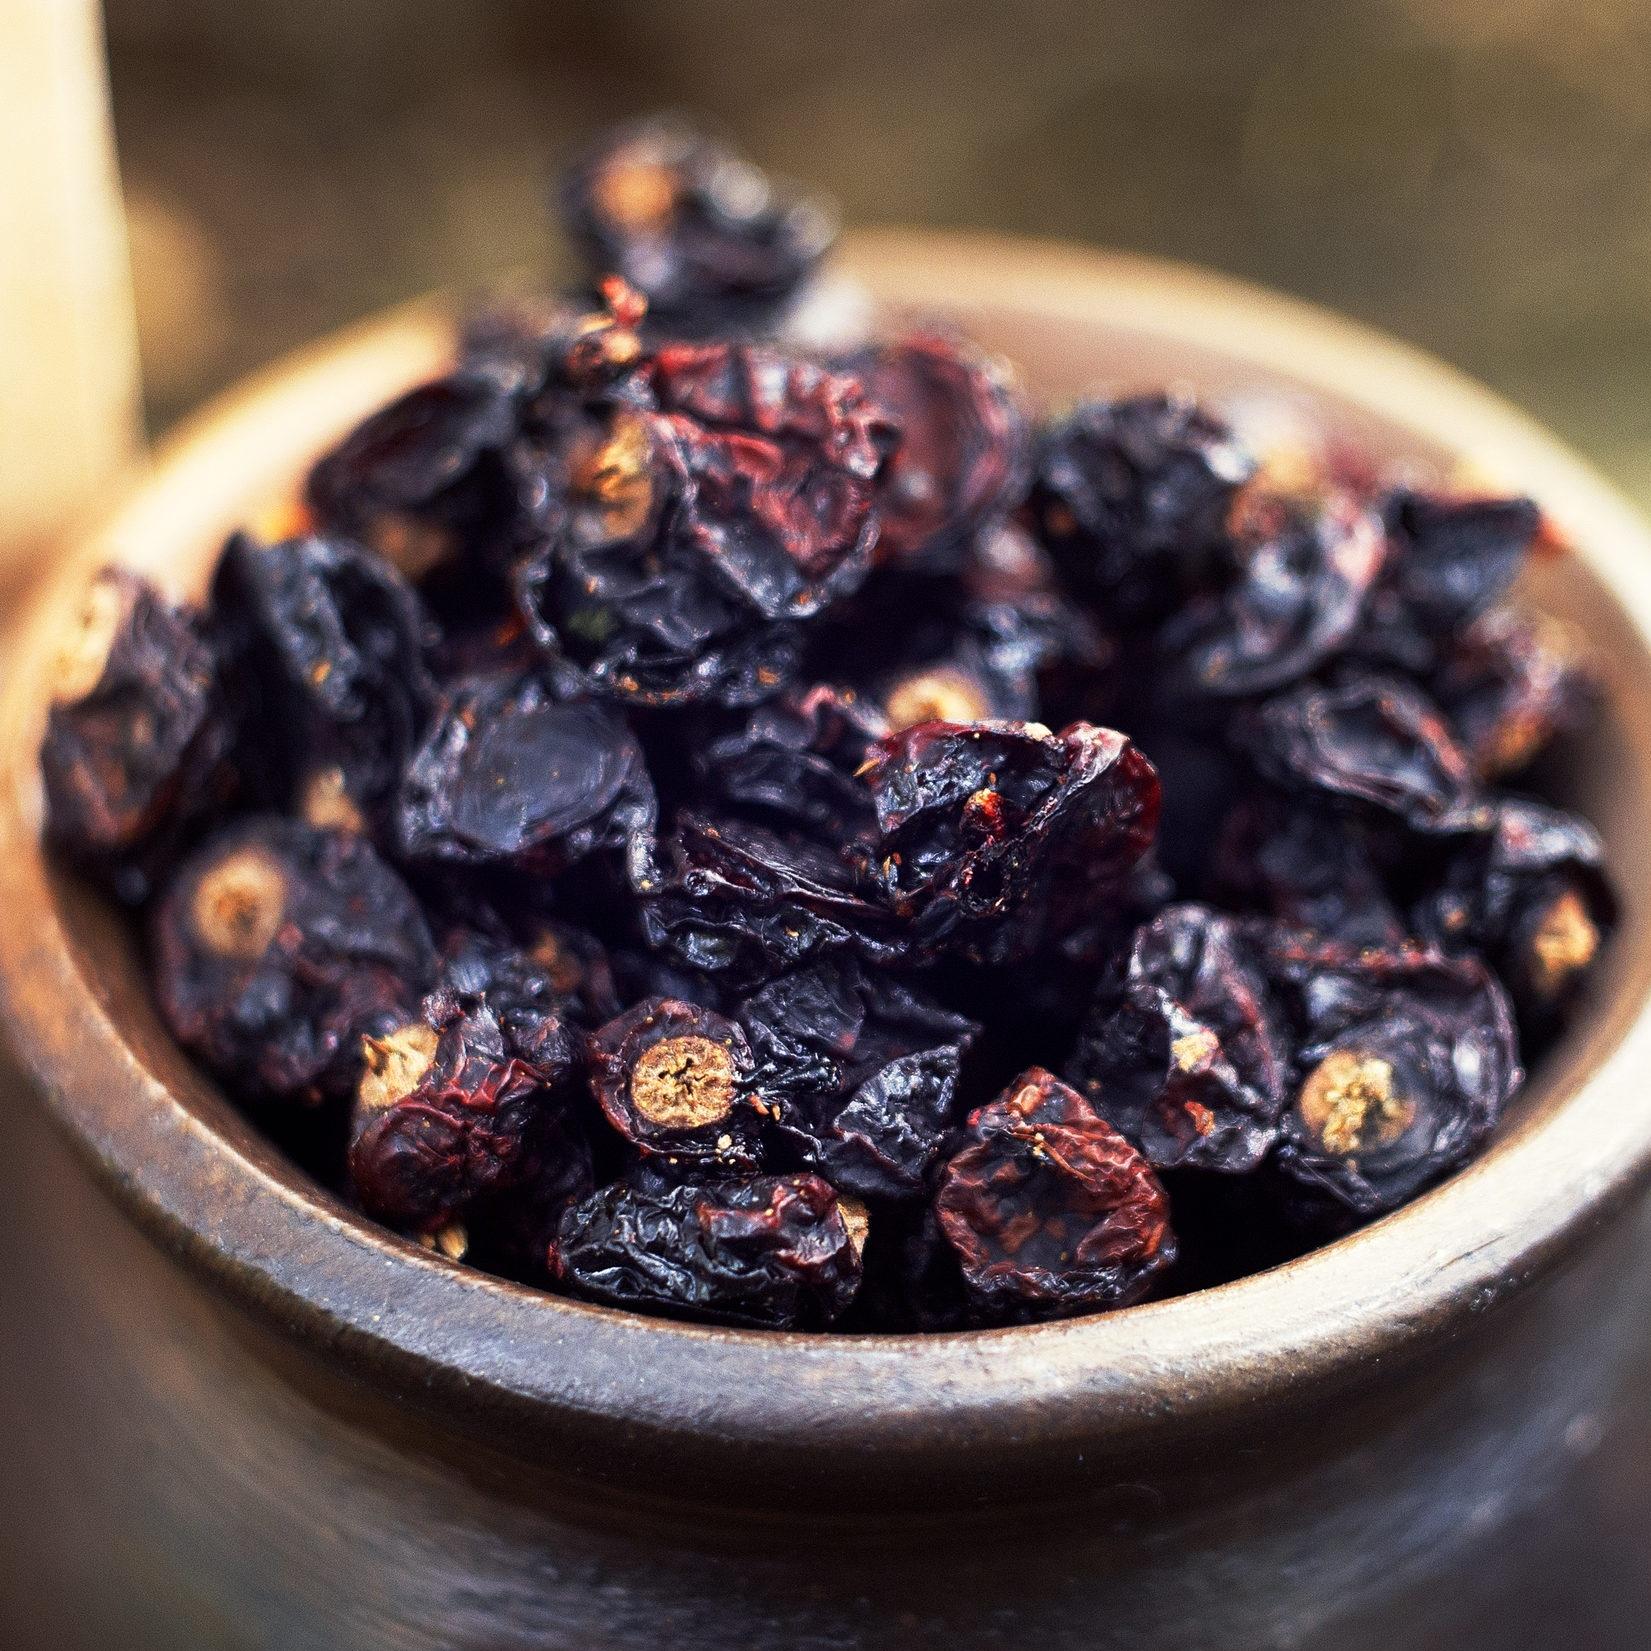 Ягоды Смородина чёрная, сушёная currant-wild-berry-02.jpg